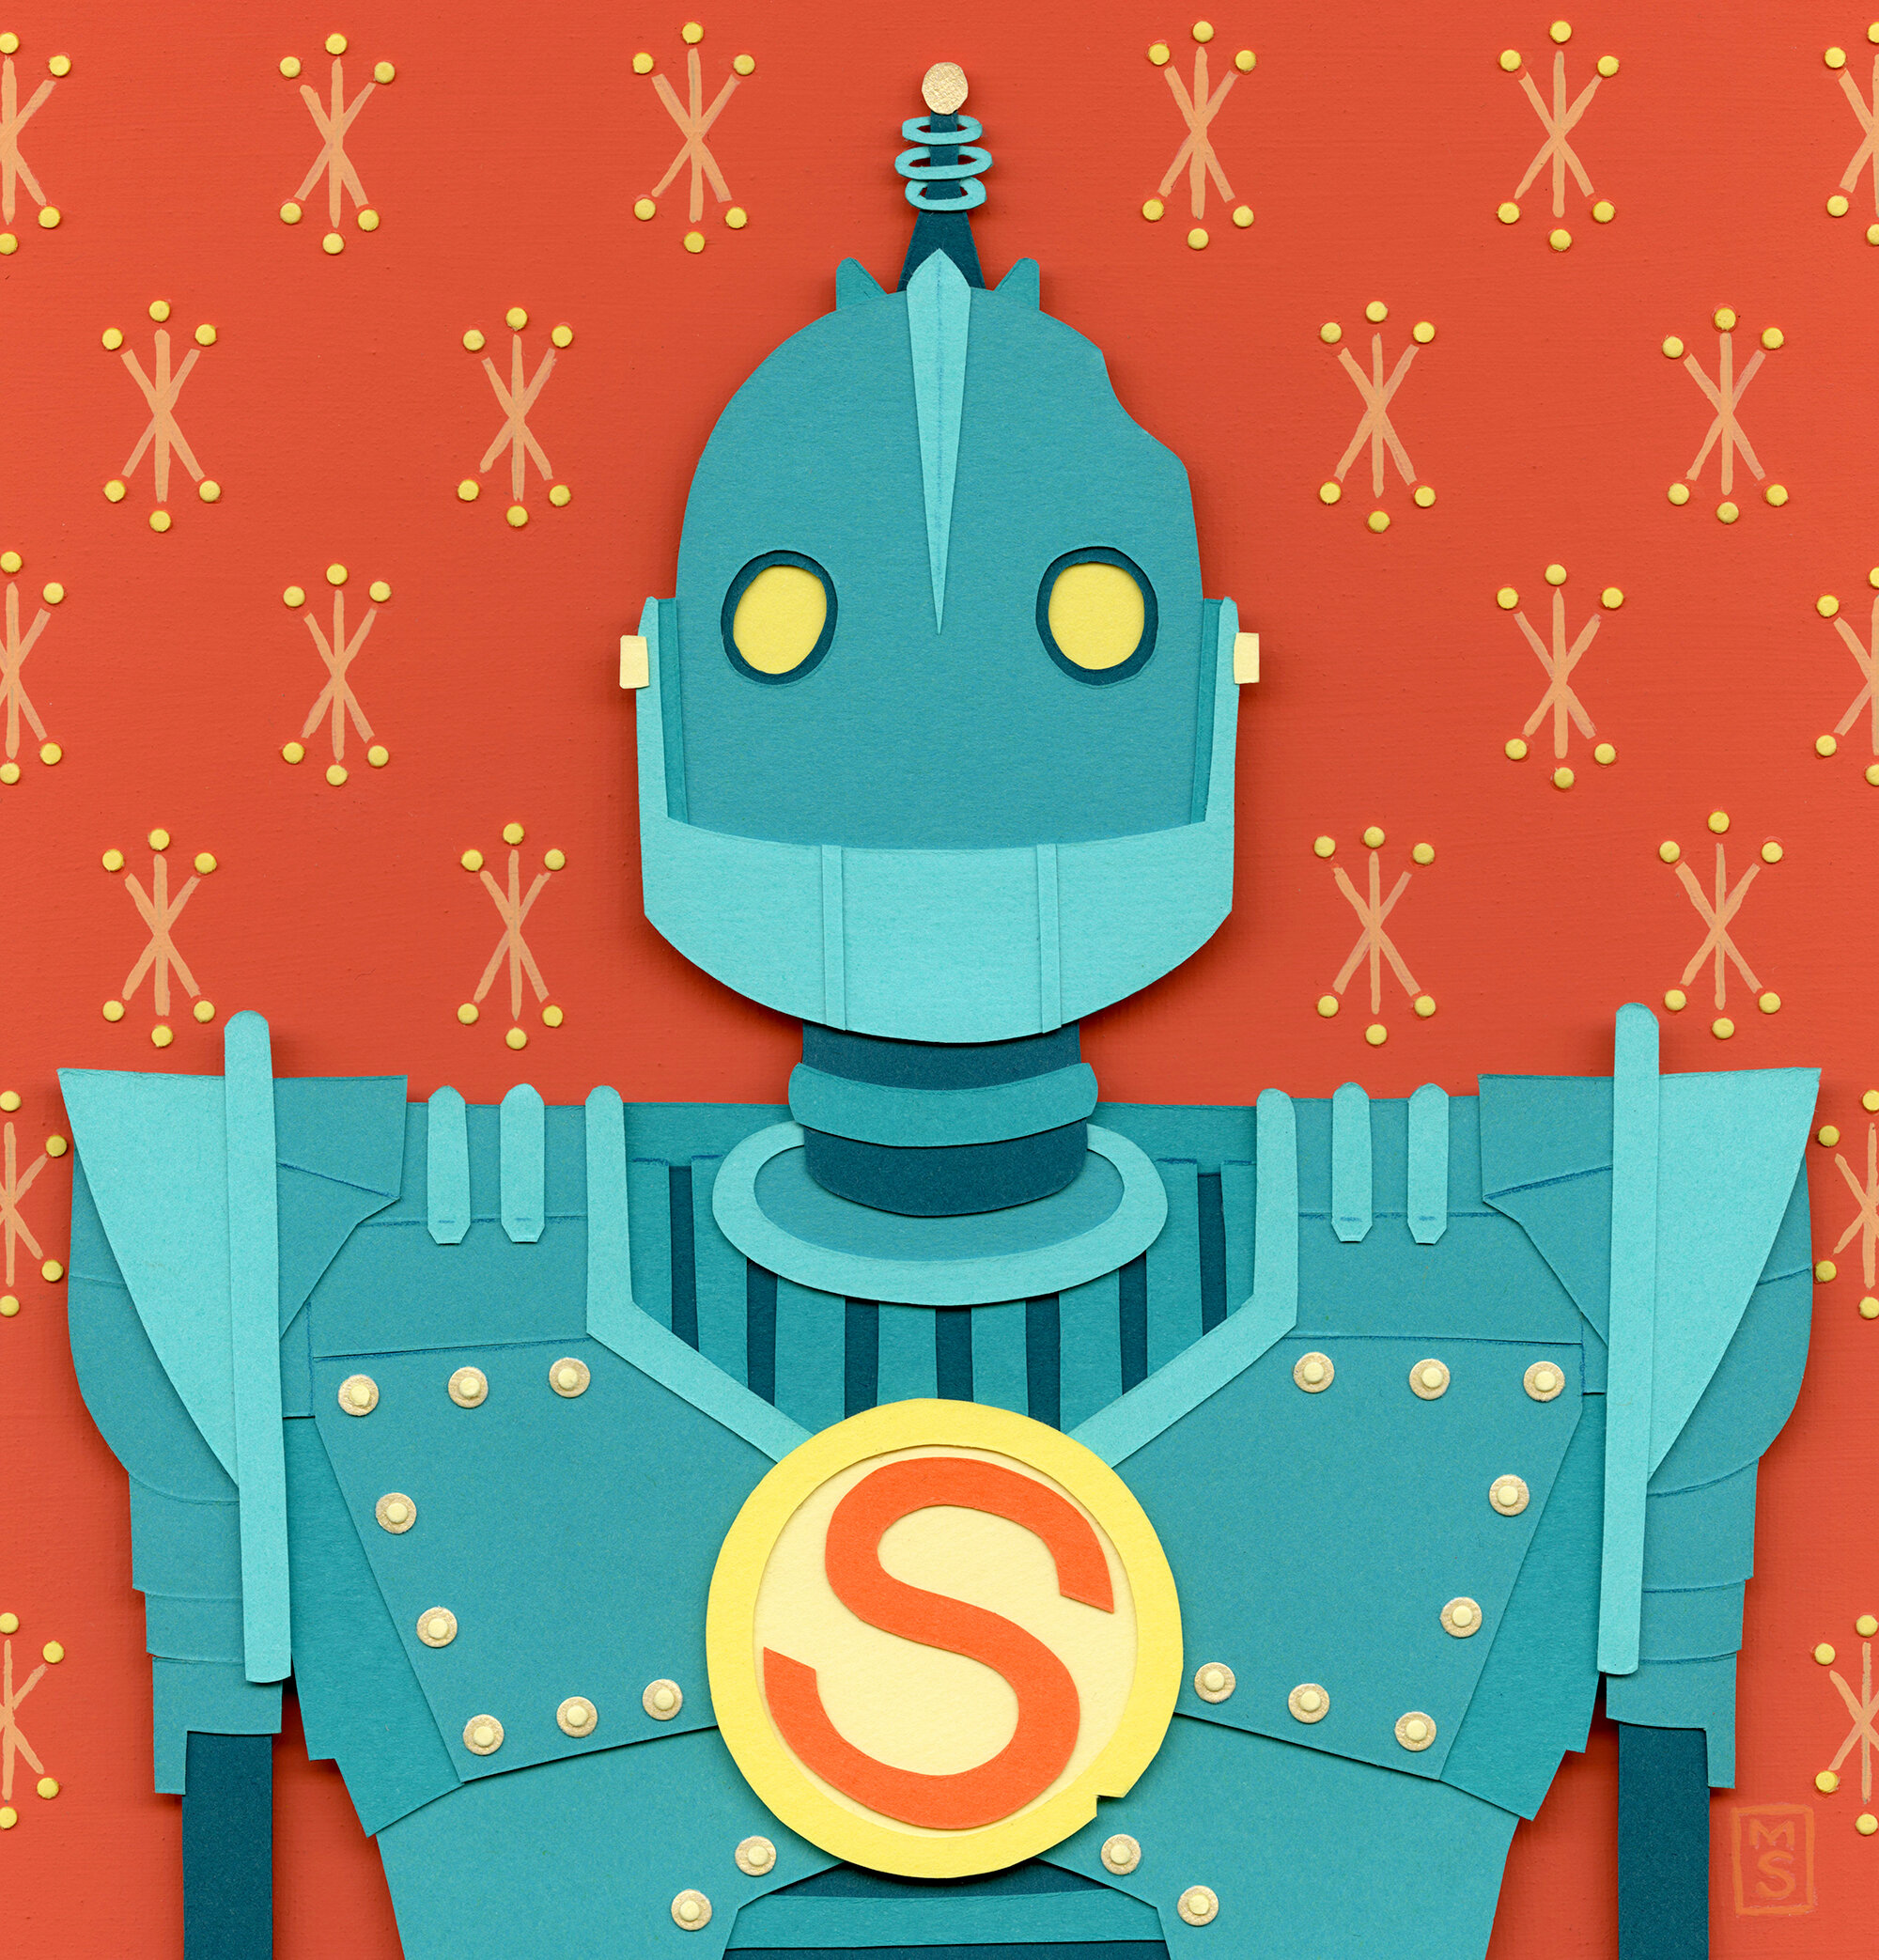 Stratman_C4C13_IronGiant.jpg